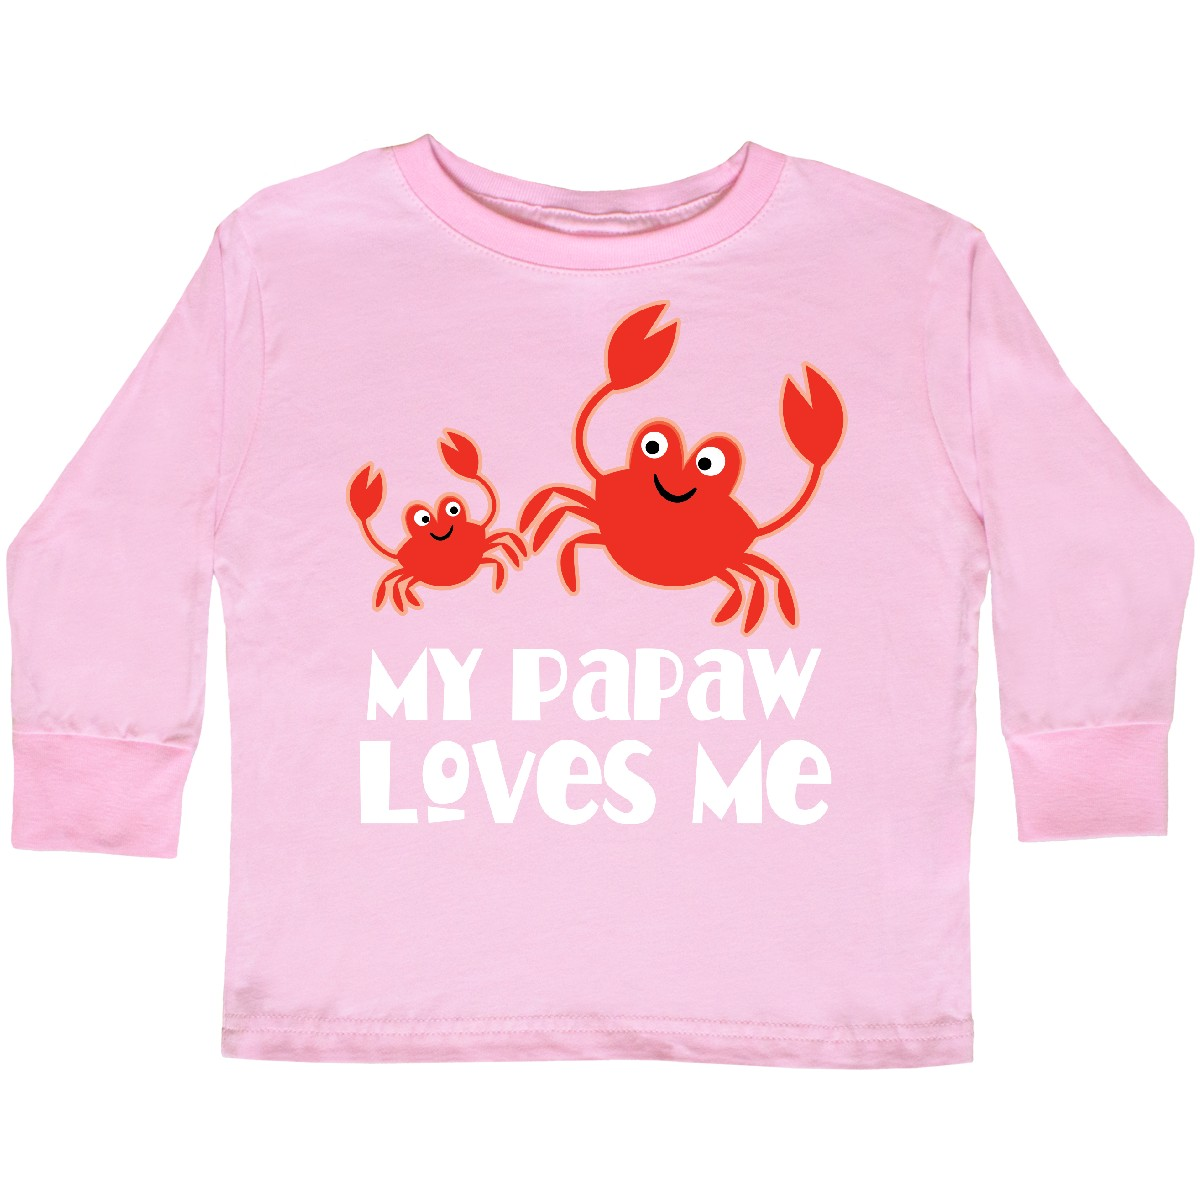 Efbj Toddler Baby Boys Rompers Sleeveless Cotton Jumpsuit,Eat Sleep Kick Karate Outfit Spring Pajamas